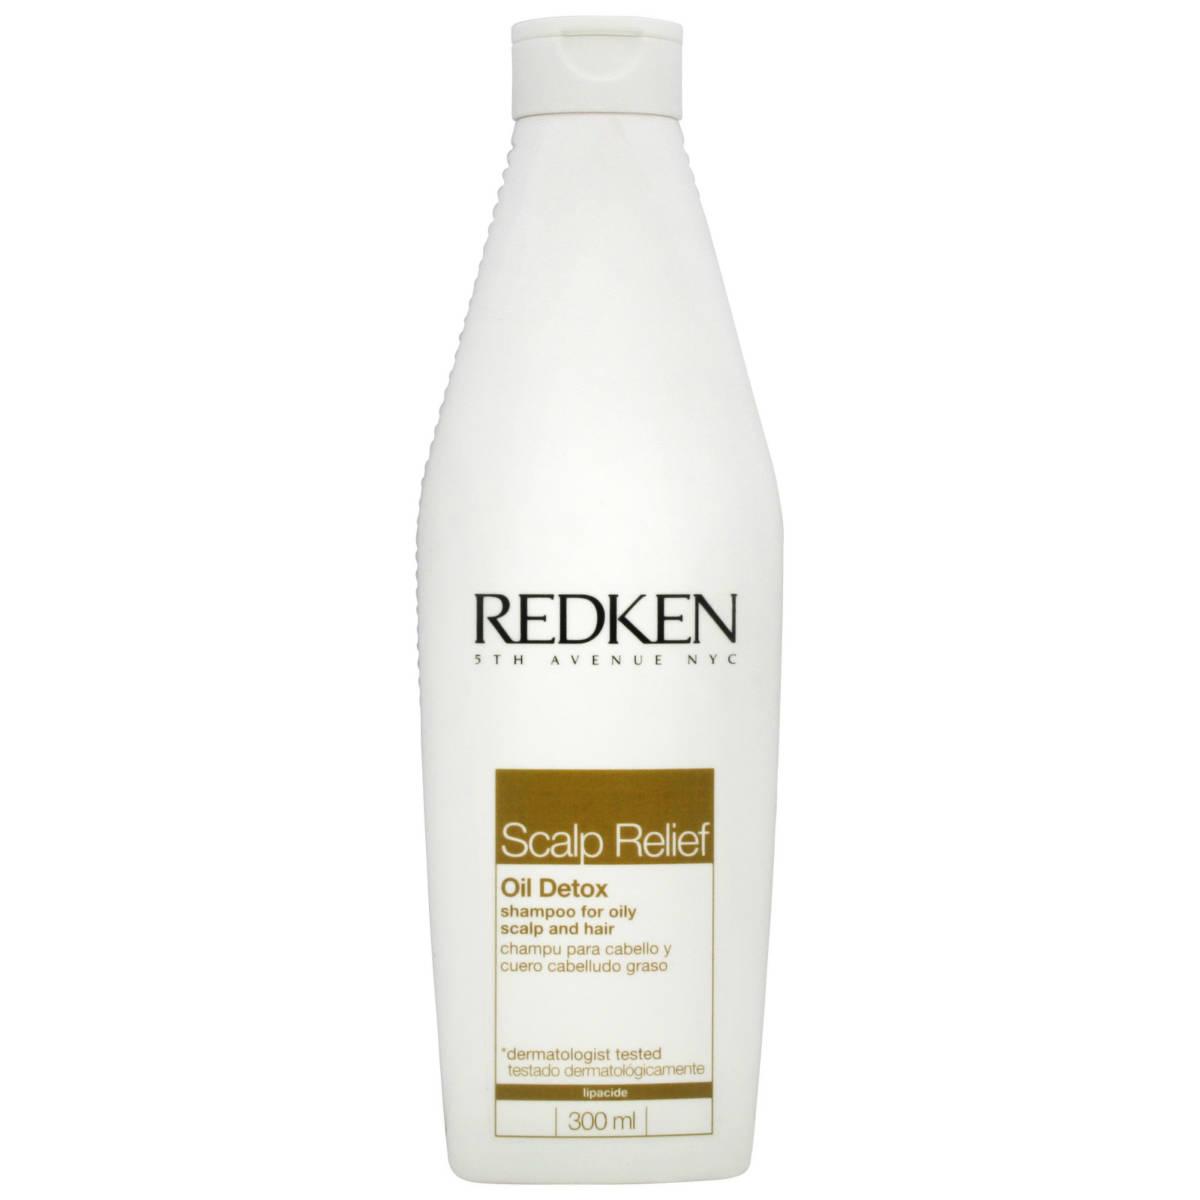 Tuotekuva: Redken Oil Detox -shampoo (300ml)